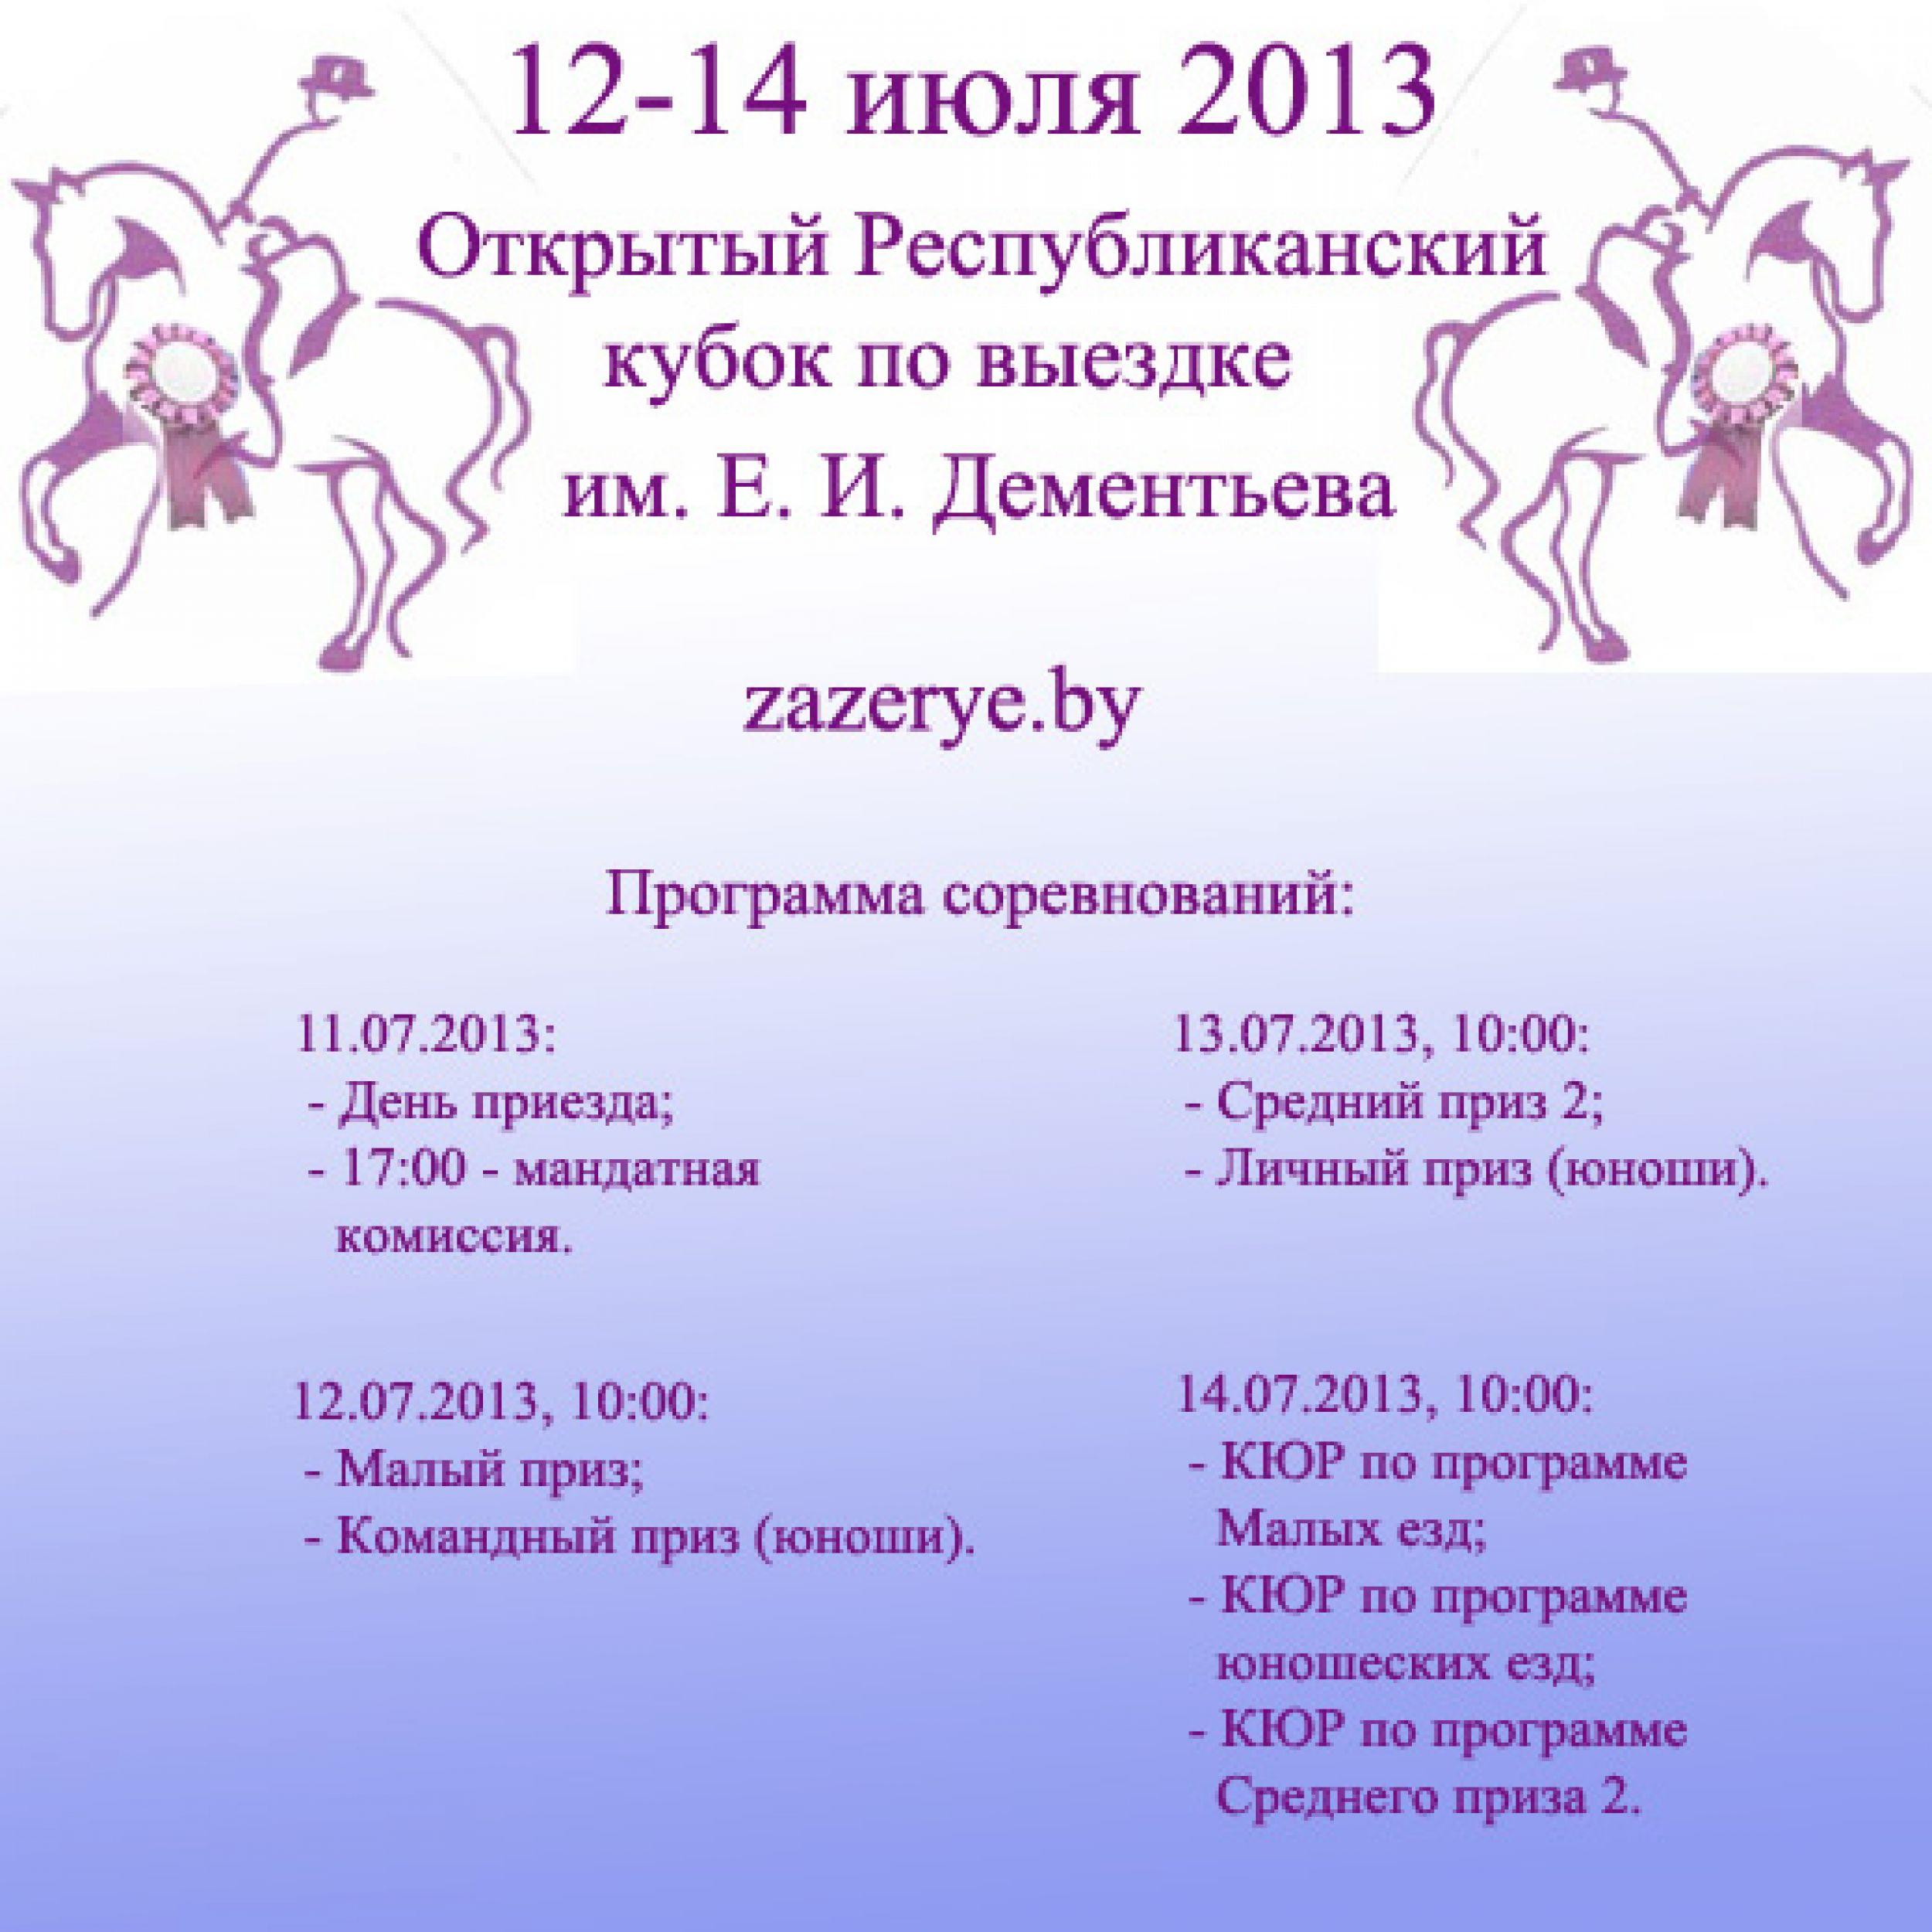 dressage-zazerye-Dementiev.jpg